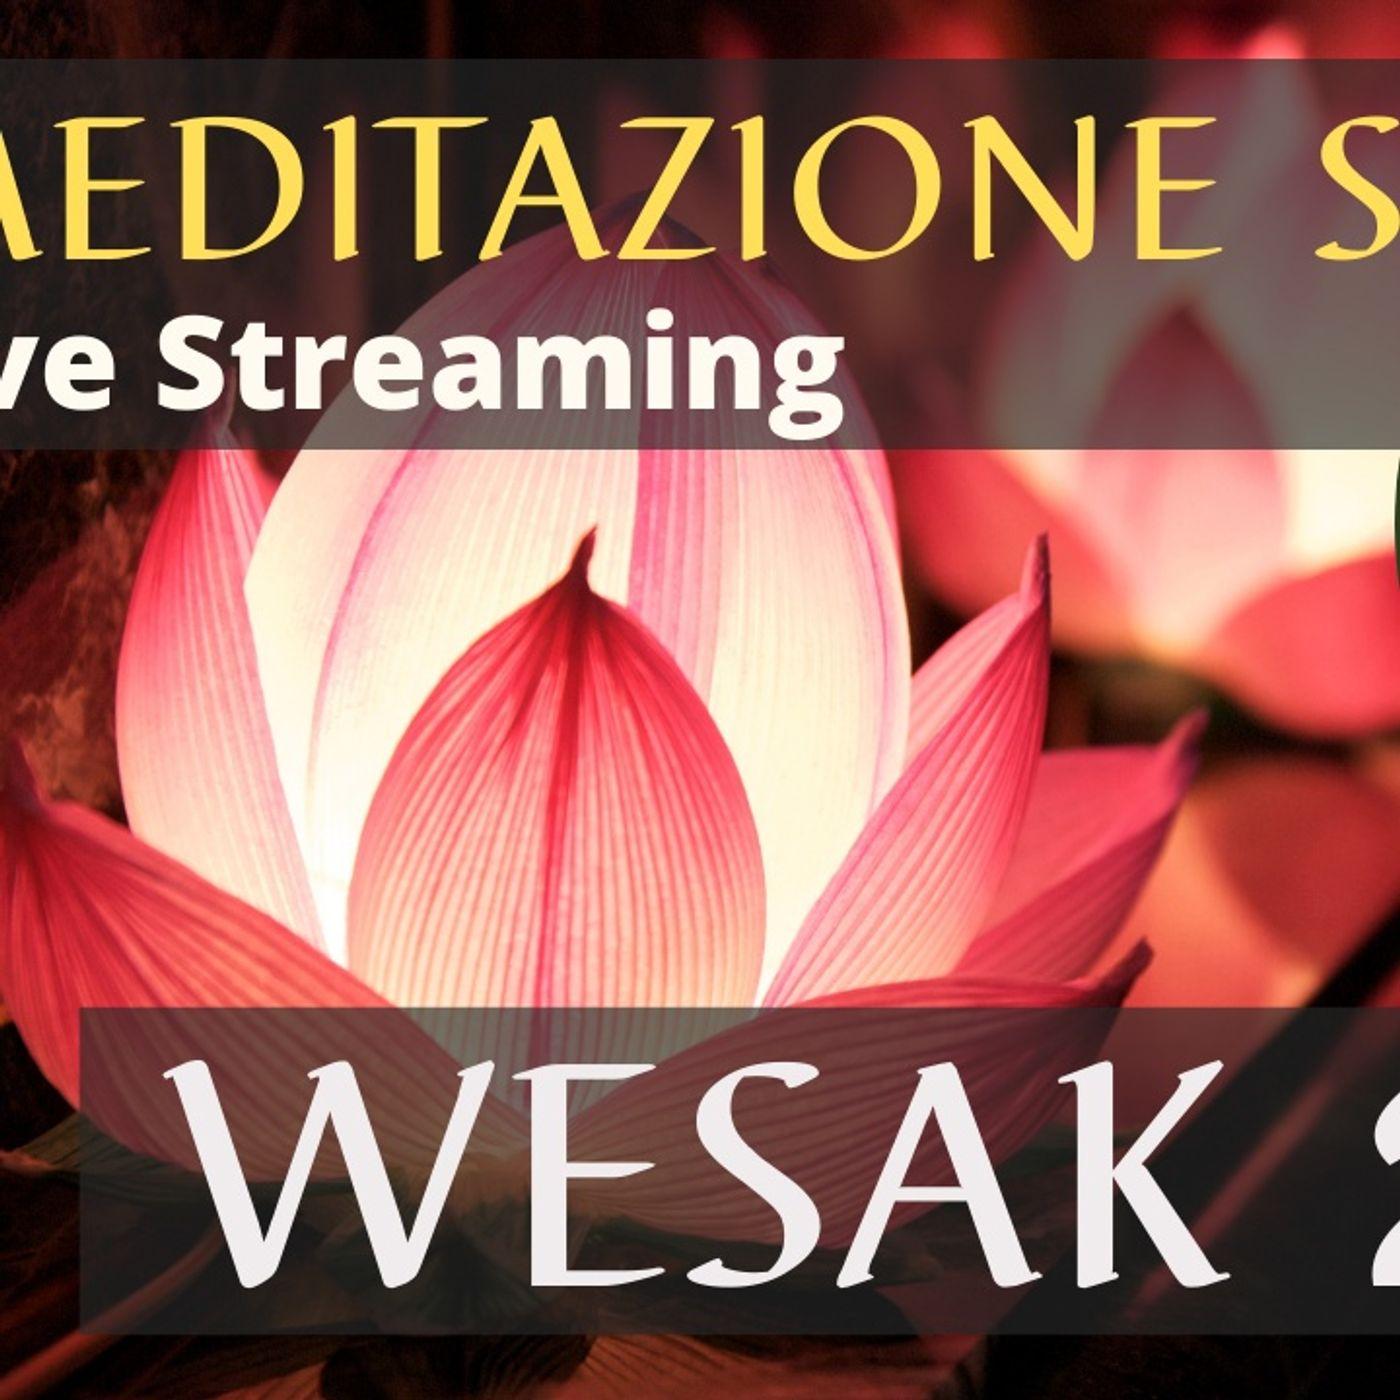 Meditazione Sonora Wesak 2021 | Live Streaming